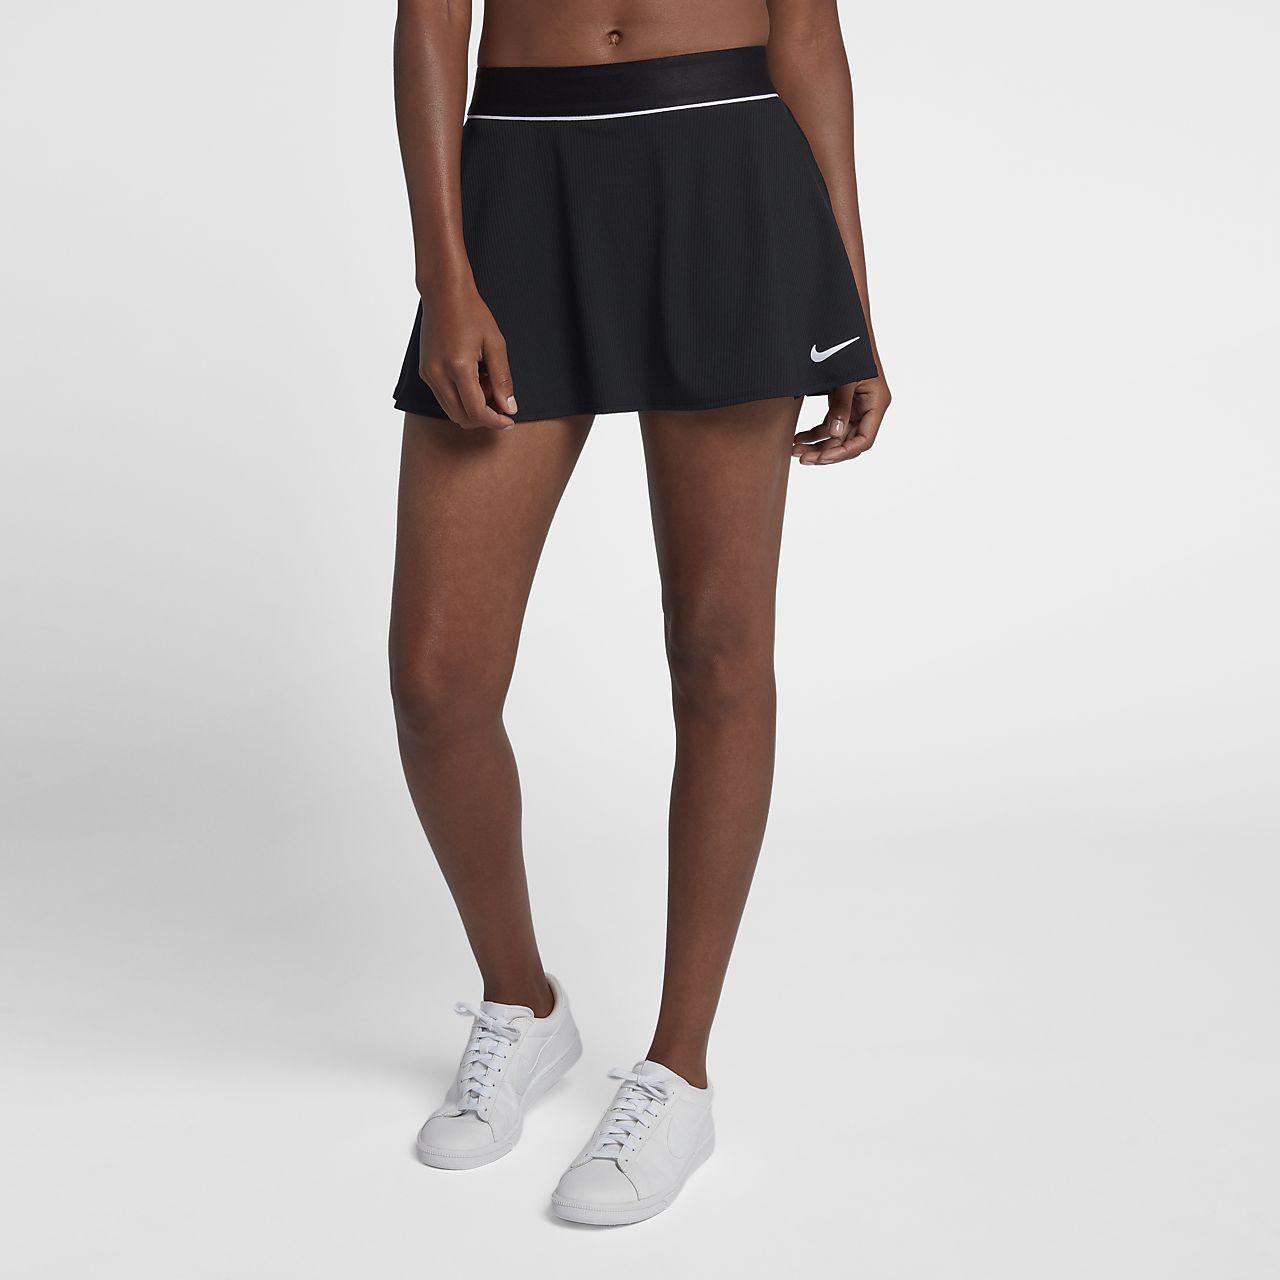 NikeCourt Dri-FIT női teniszszoknya